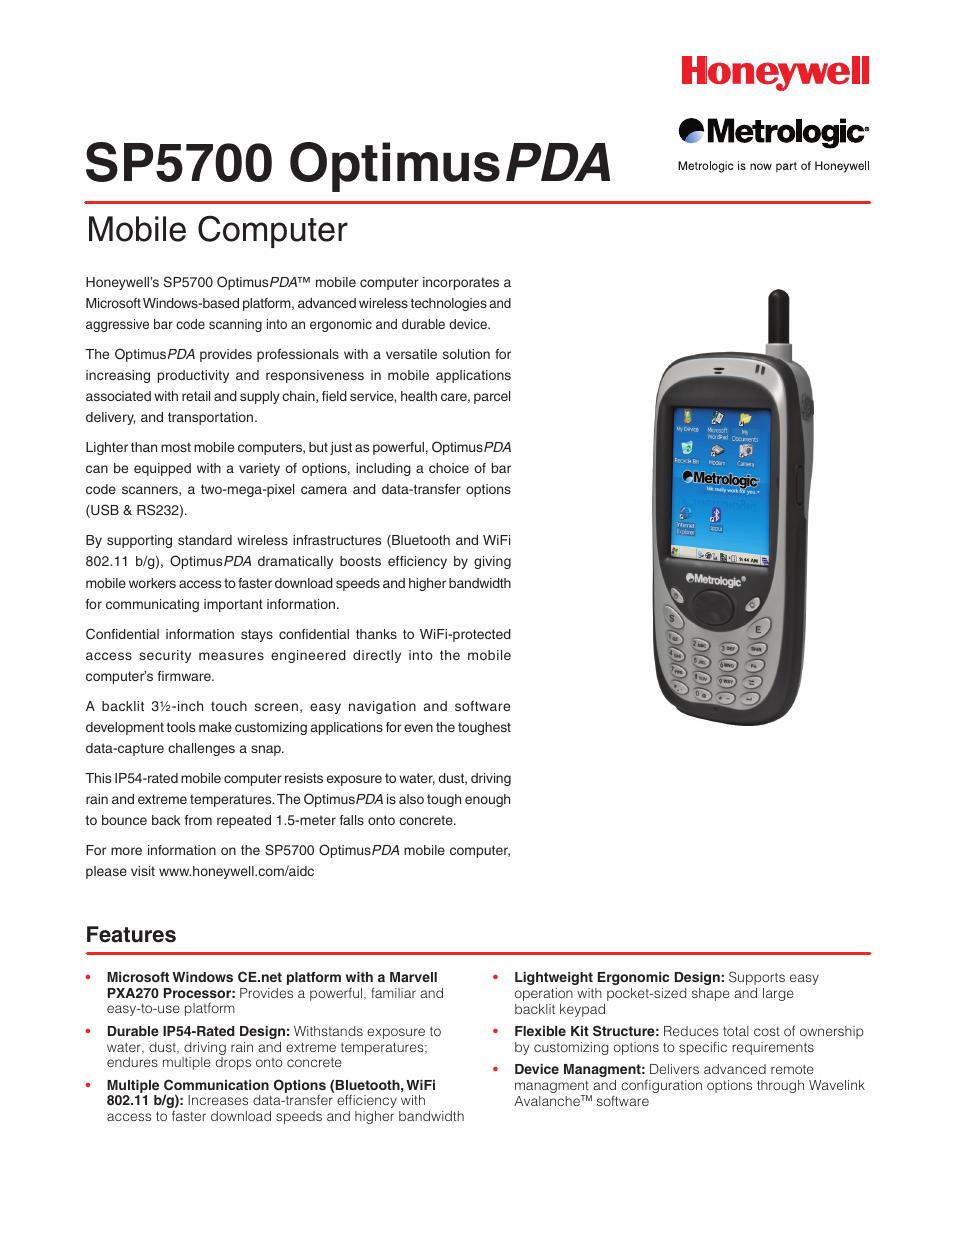 Metrologic Instruments SP5700 User Manual | 2 pages